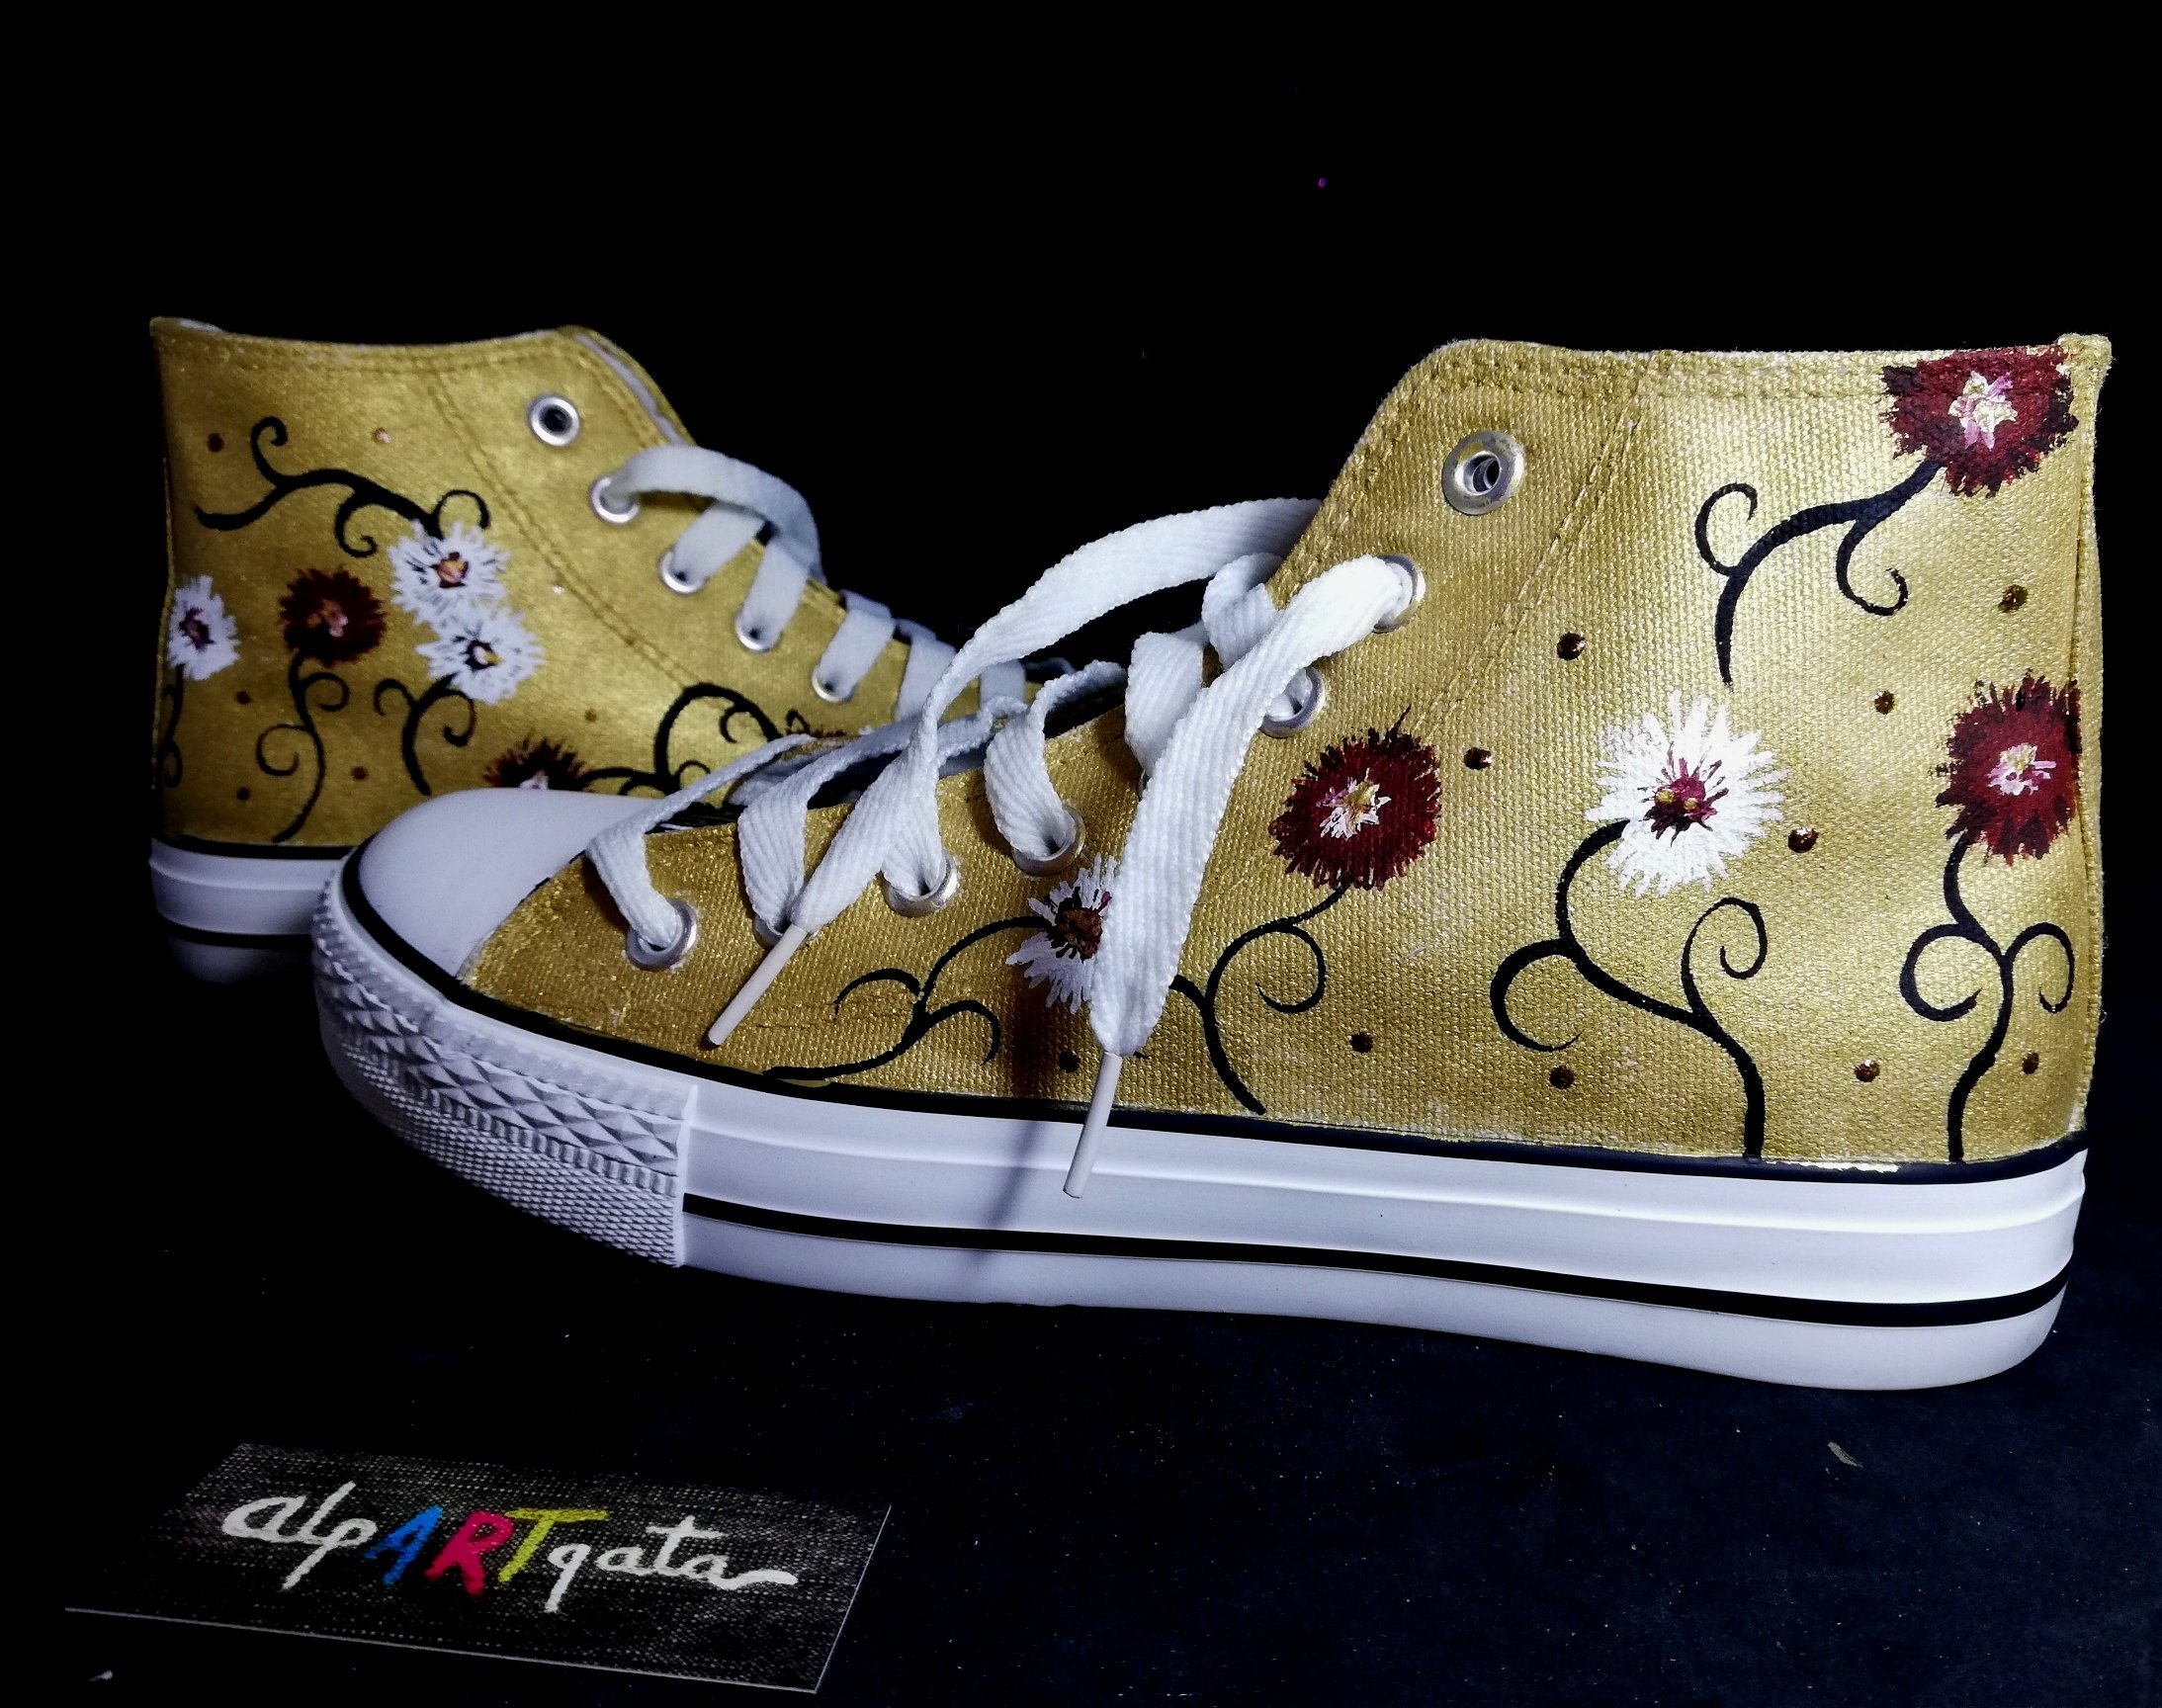 wpid-zapatillas-personalizadas-pintadas_alpartgata-flores4514551499888290345.jpg